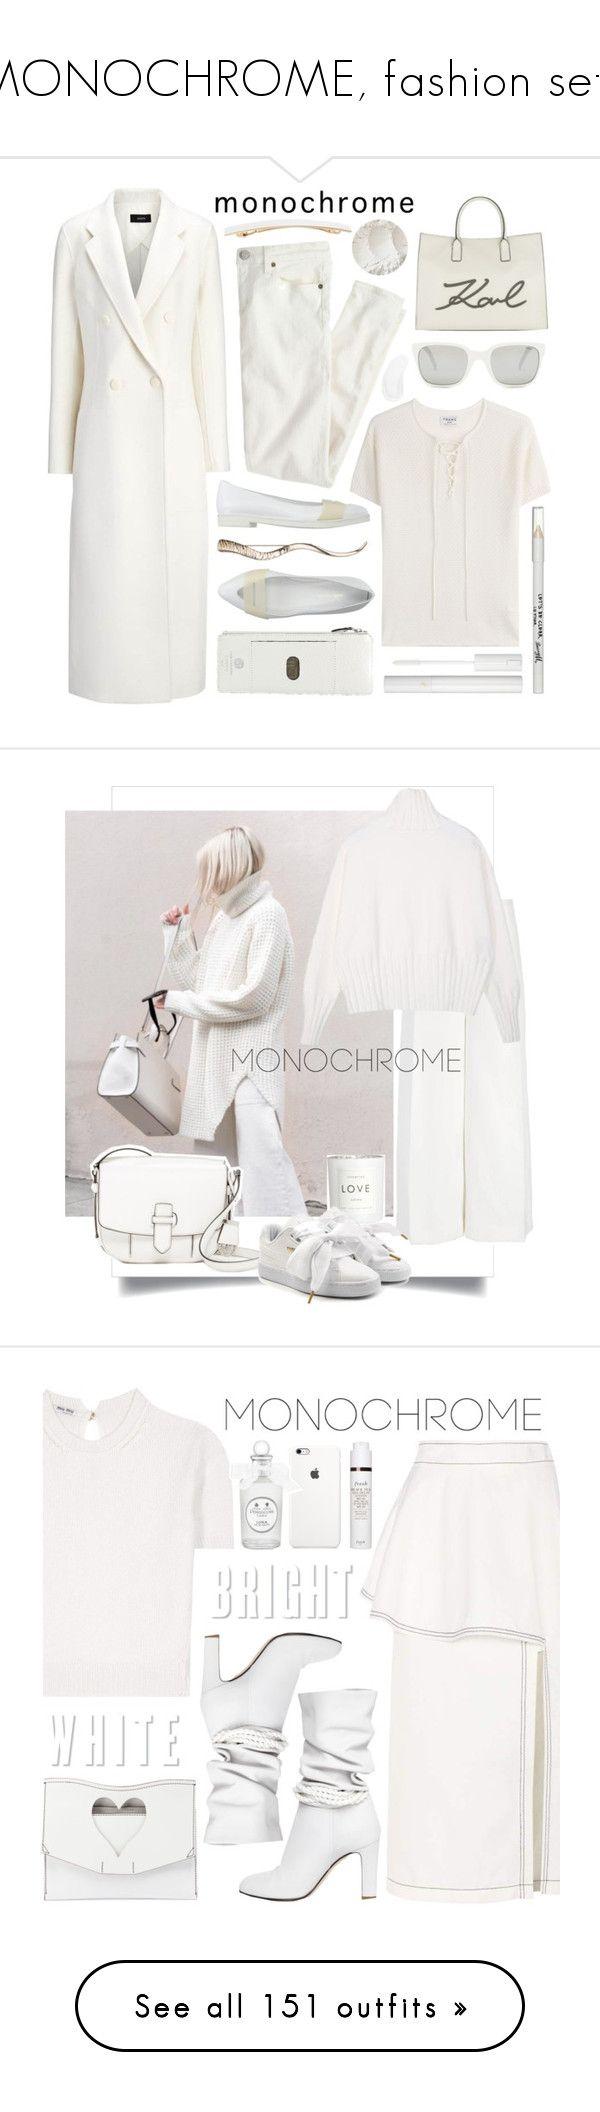 """MONOCHROME, fashion sets"" by deneve ❤ liked on Polyvore featuring Polo Ralph Lauren, Frame, Joseph, J.Crew, megumi ochi, Alexis Bittar, Lodis, Karl Lagerfeld, Temptu and Lancôme"